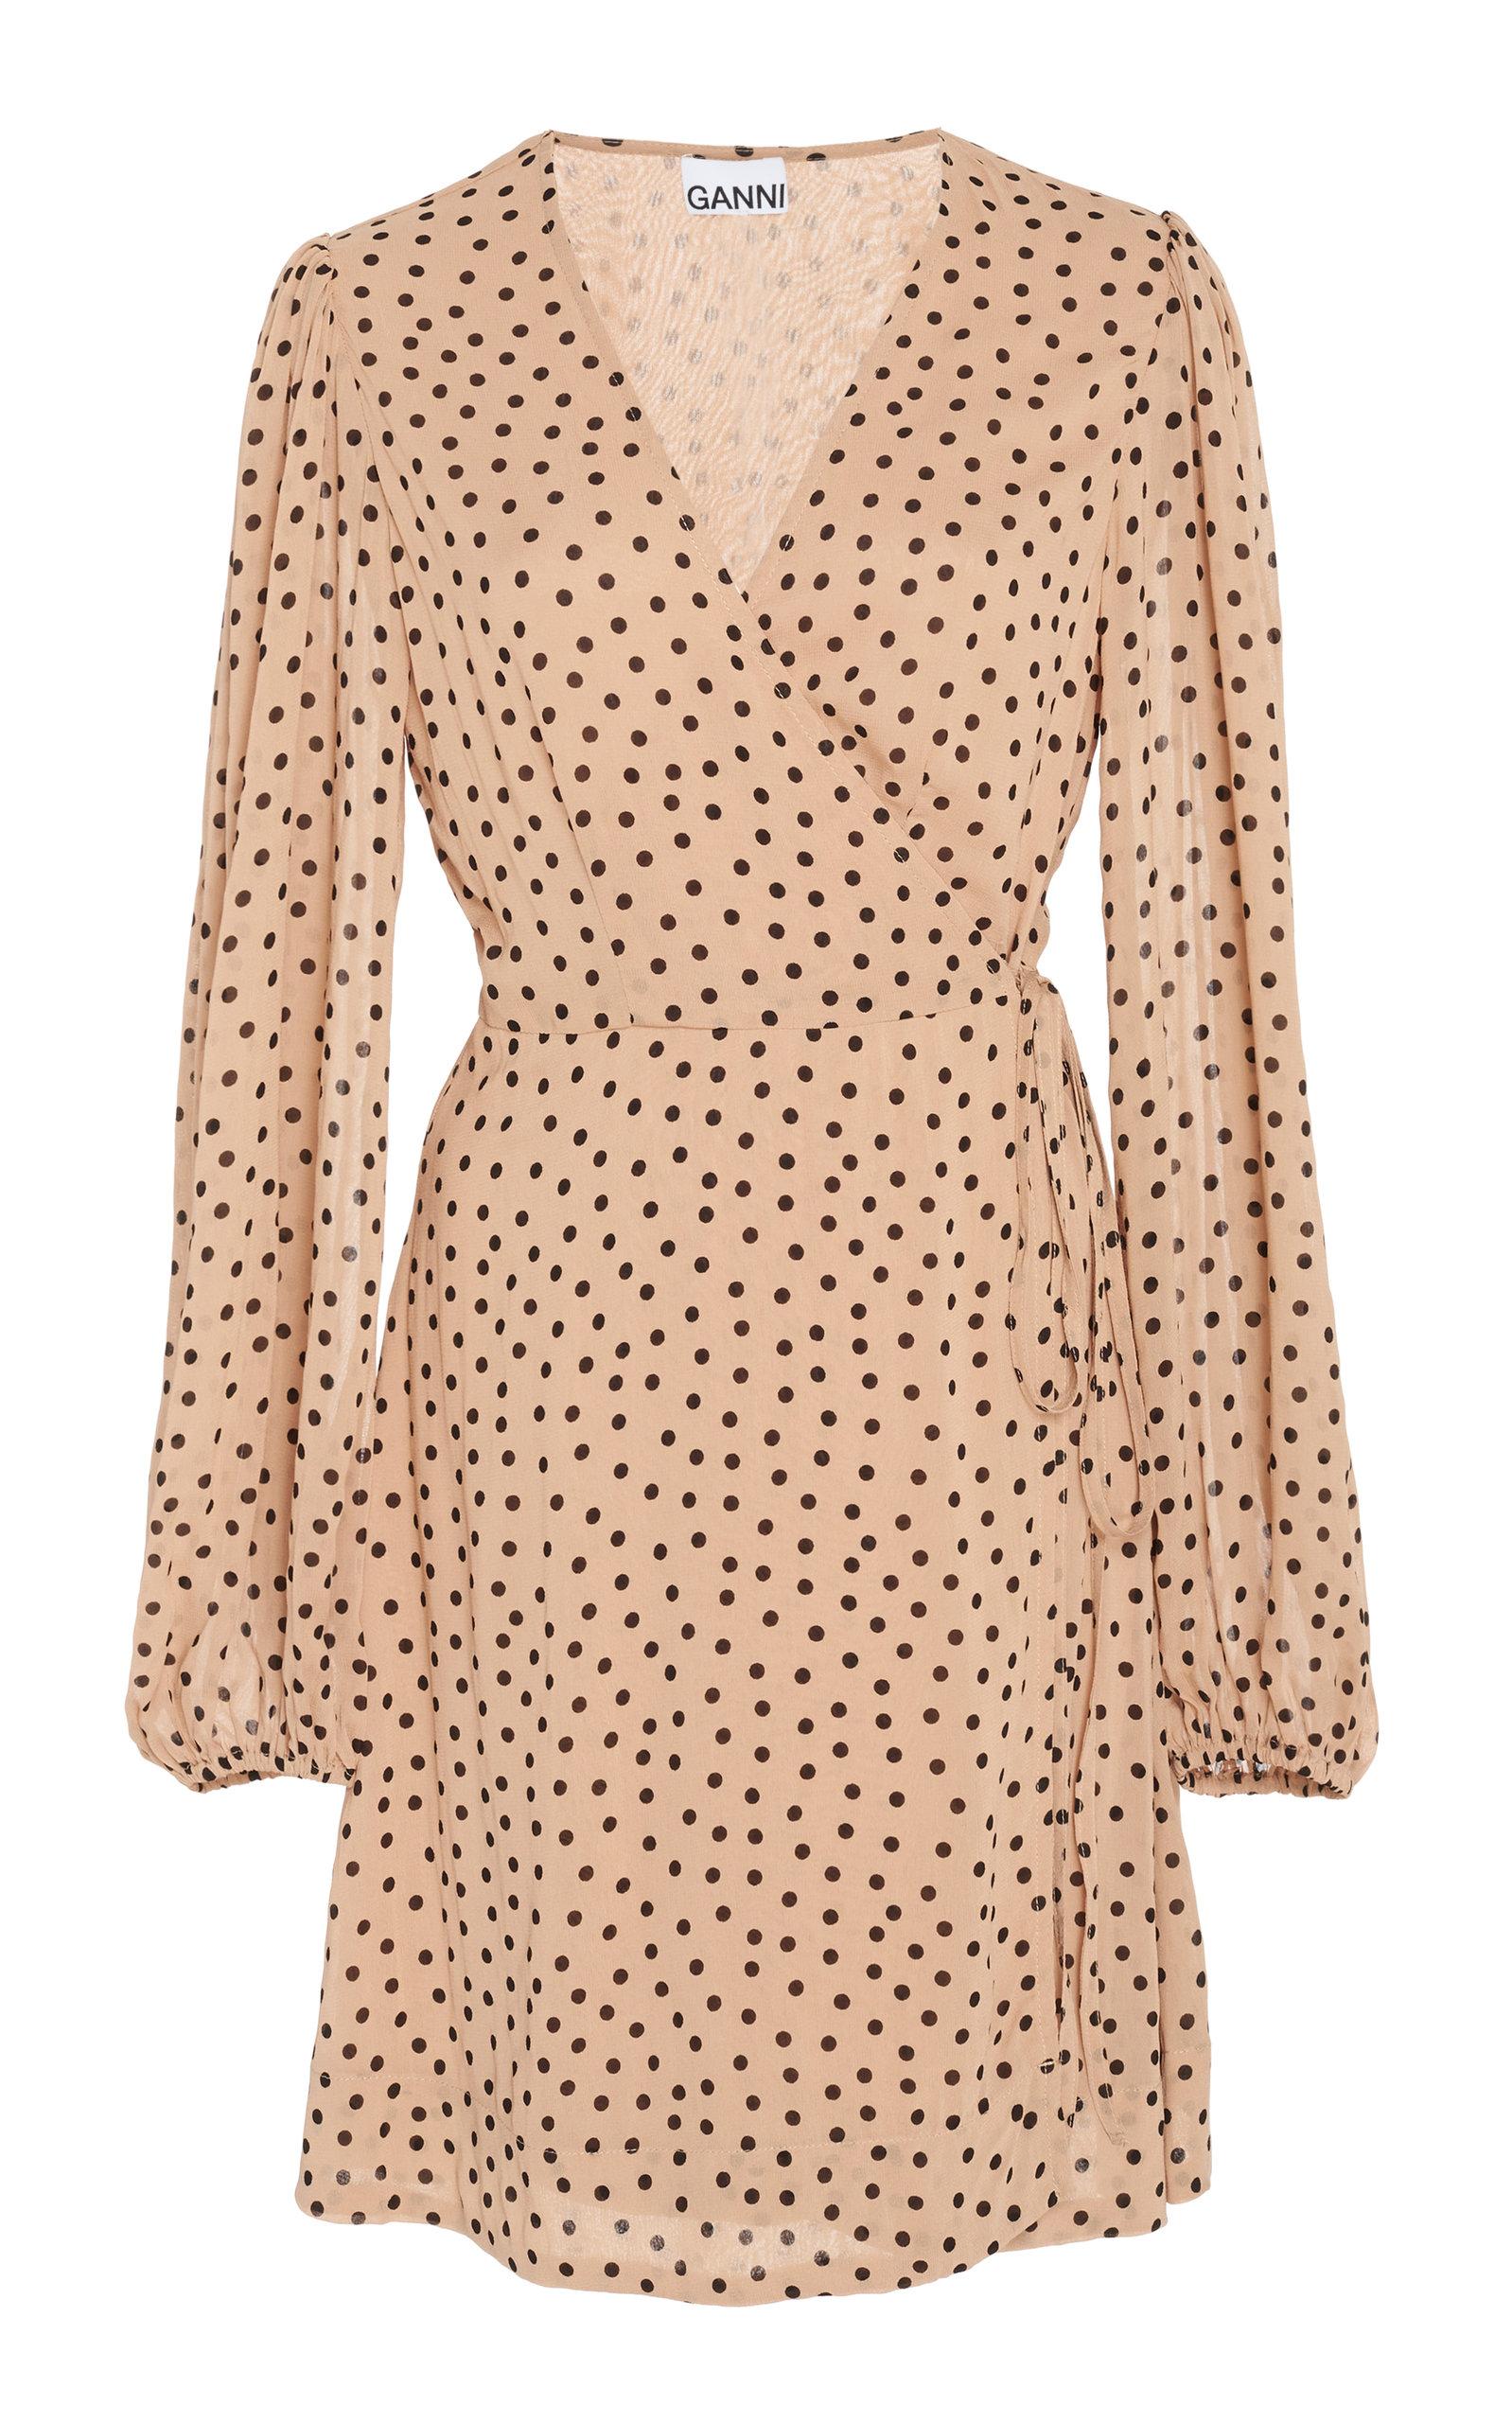 19506540a001 Polka-Dot Georgette Mini Wrap Dress by Ganni | Moda Operandi